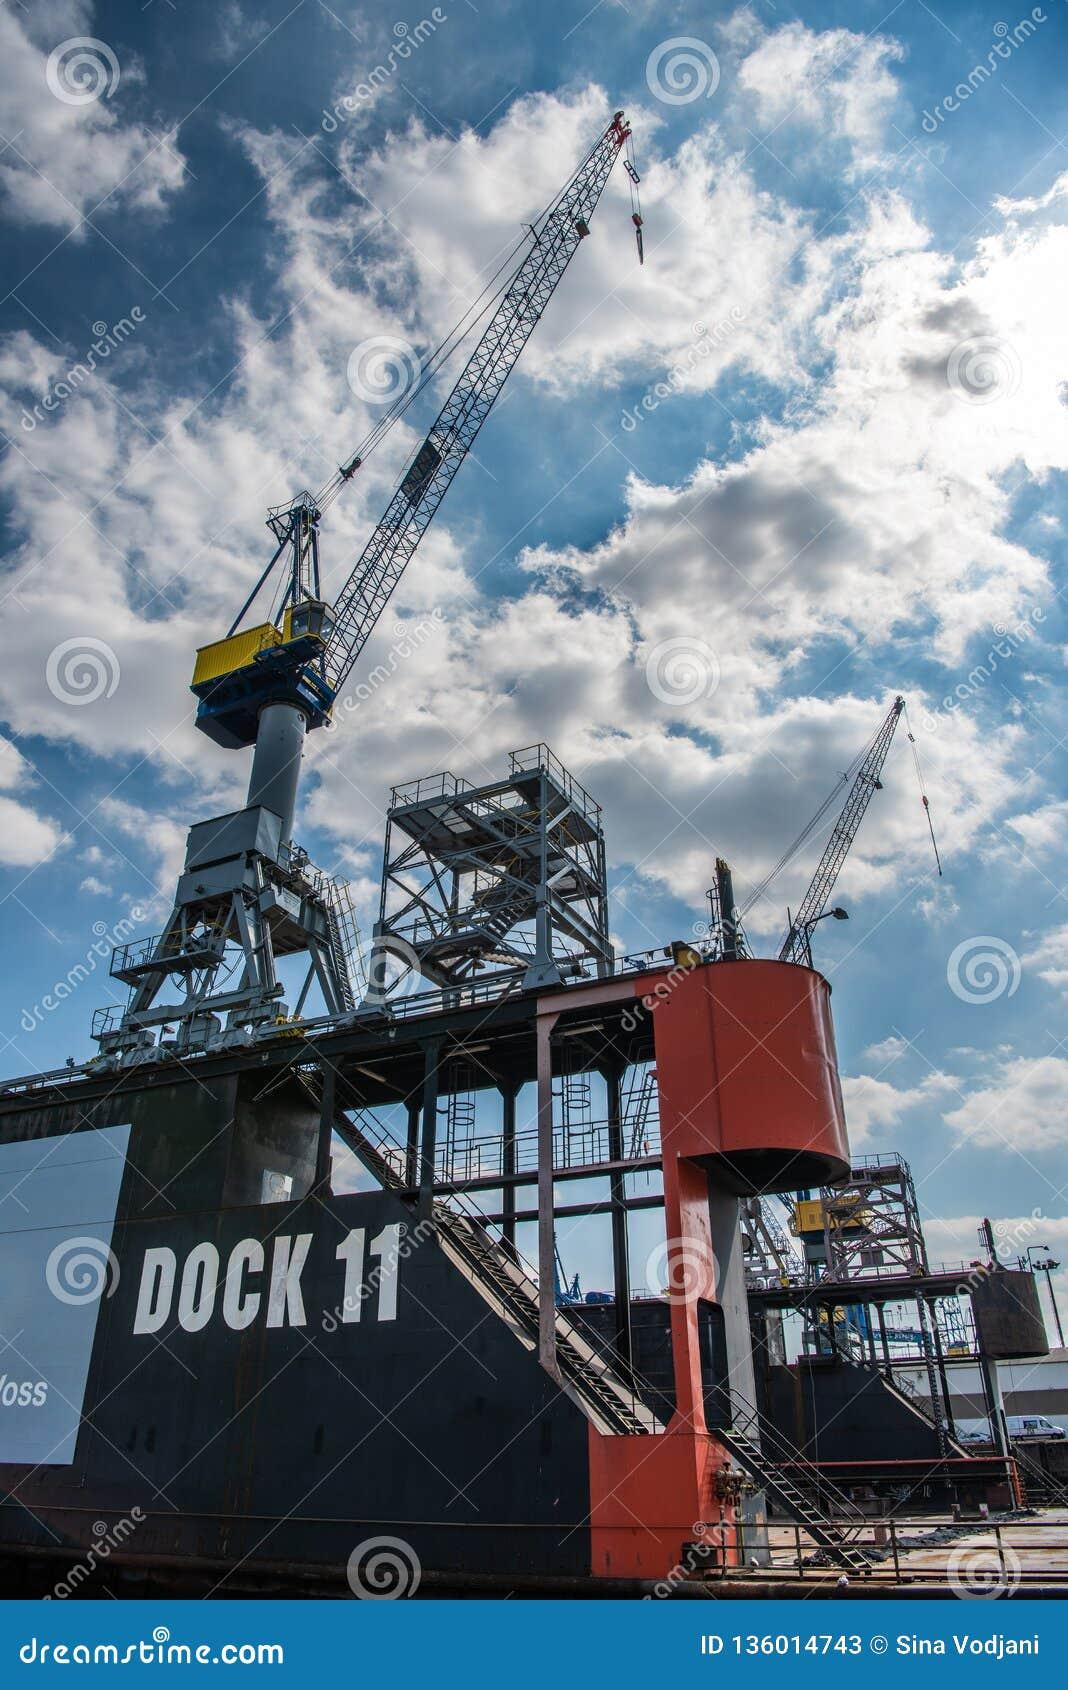 Dock 10 hamburg